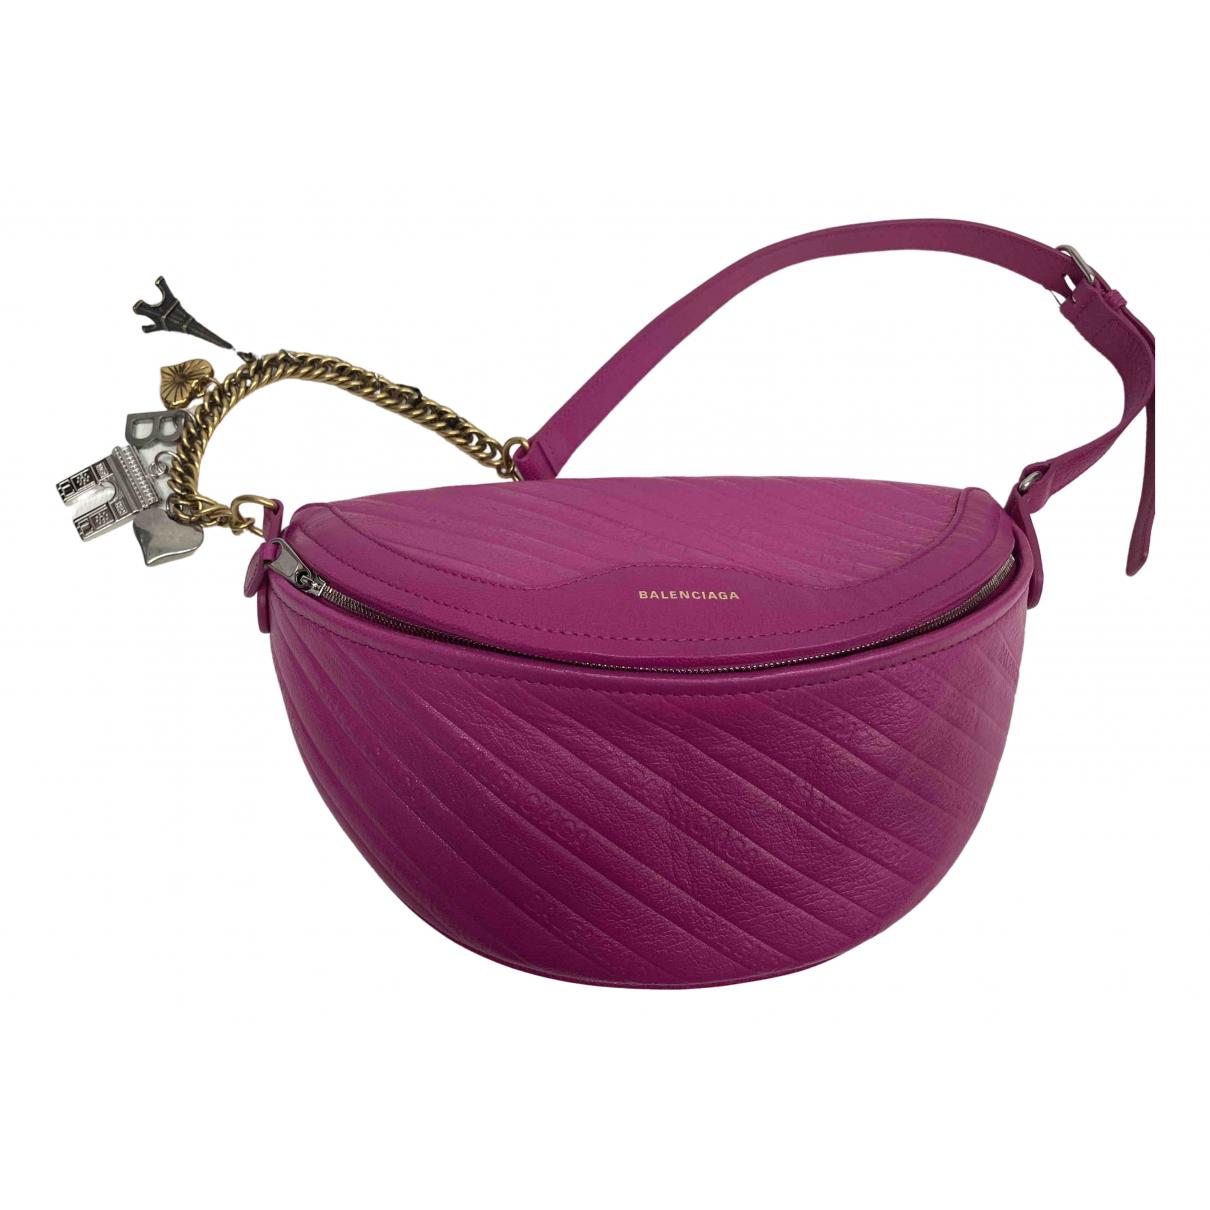 Balenciaga Souvenir XS Pink Leather Clutch bag for Women \N